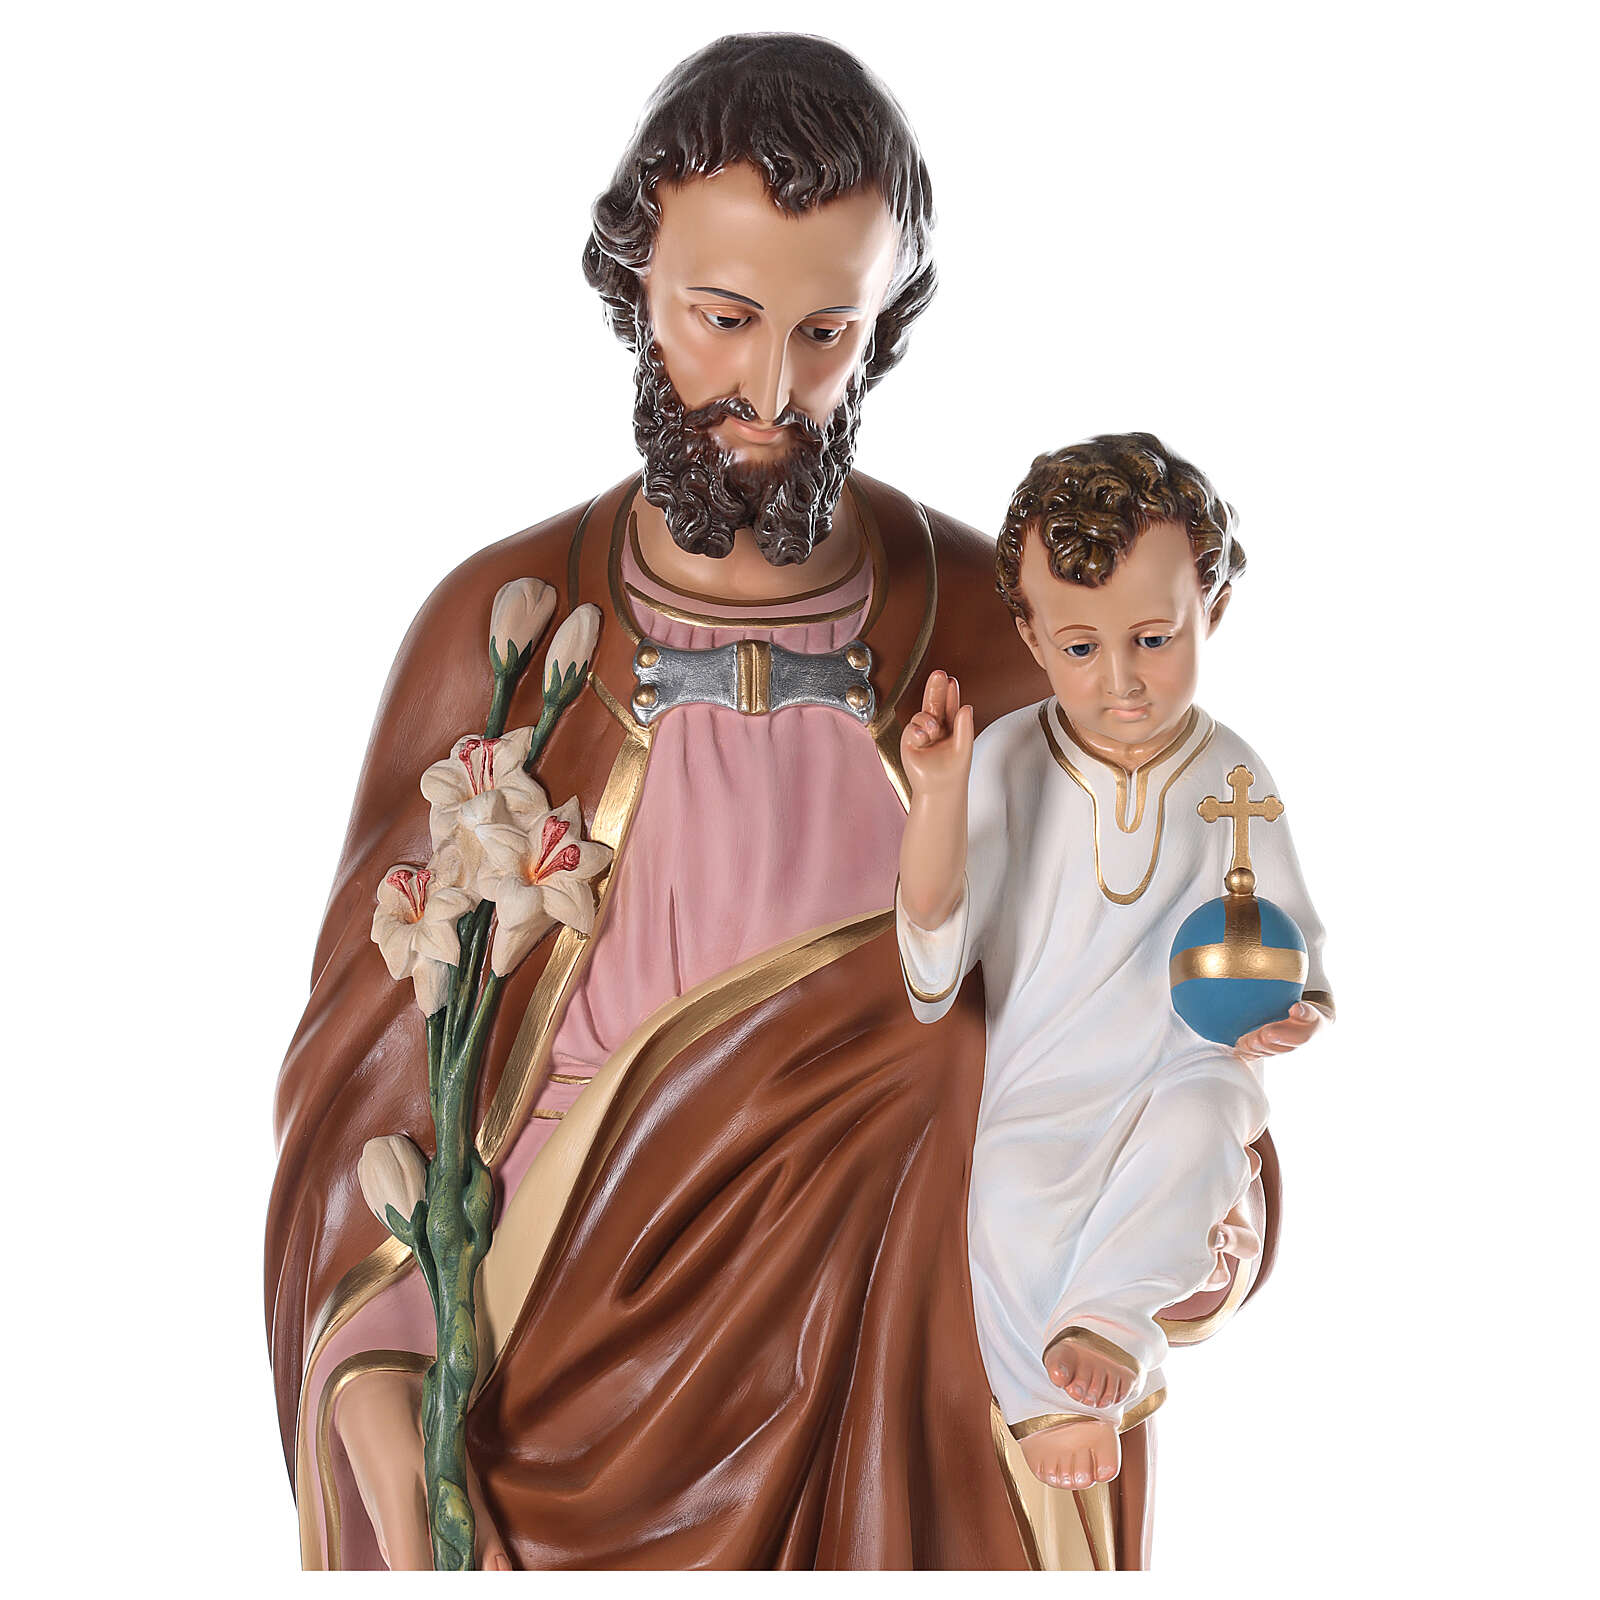 Statua San Giuseppe vetroresina colorata 130 cm occhi vetro 4